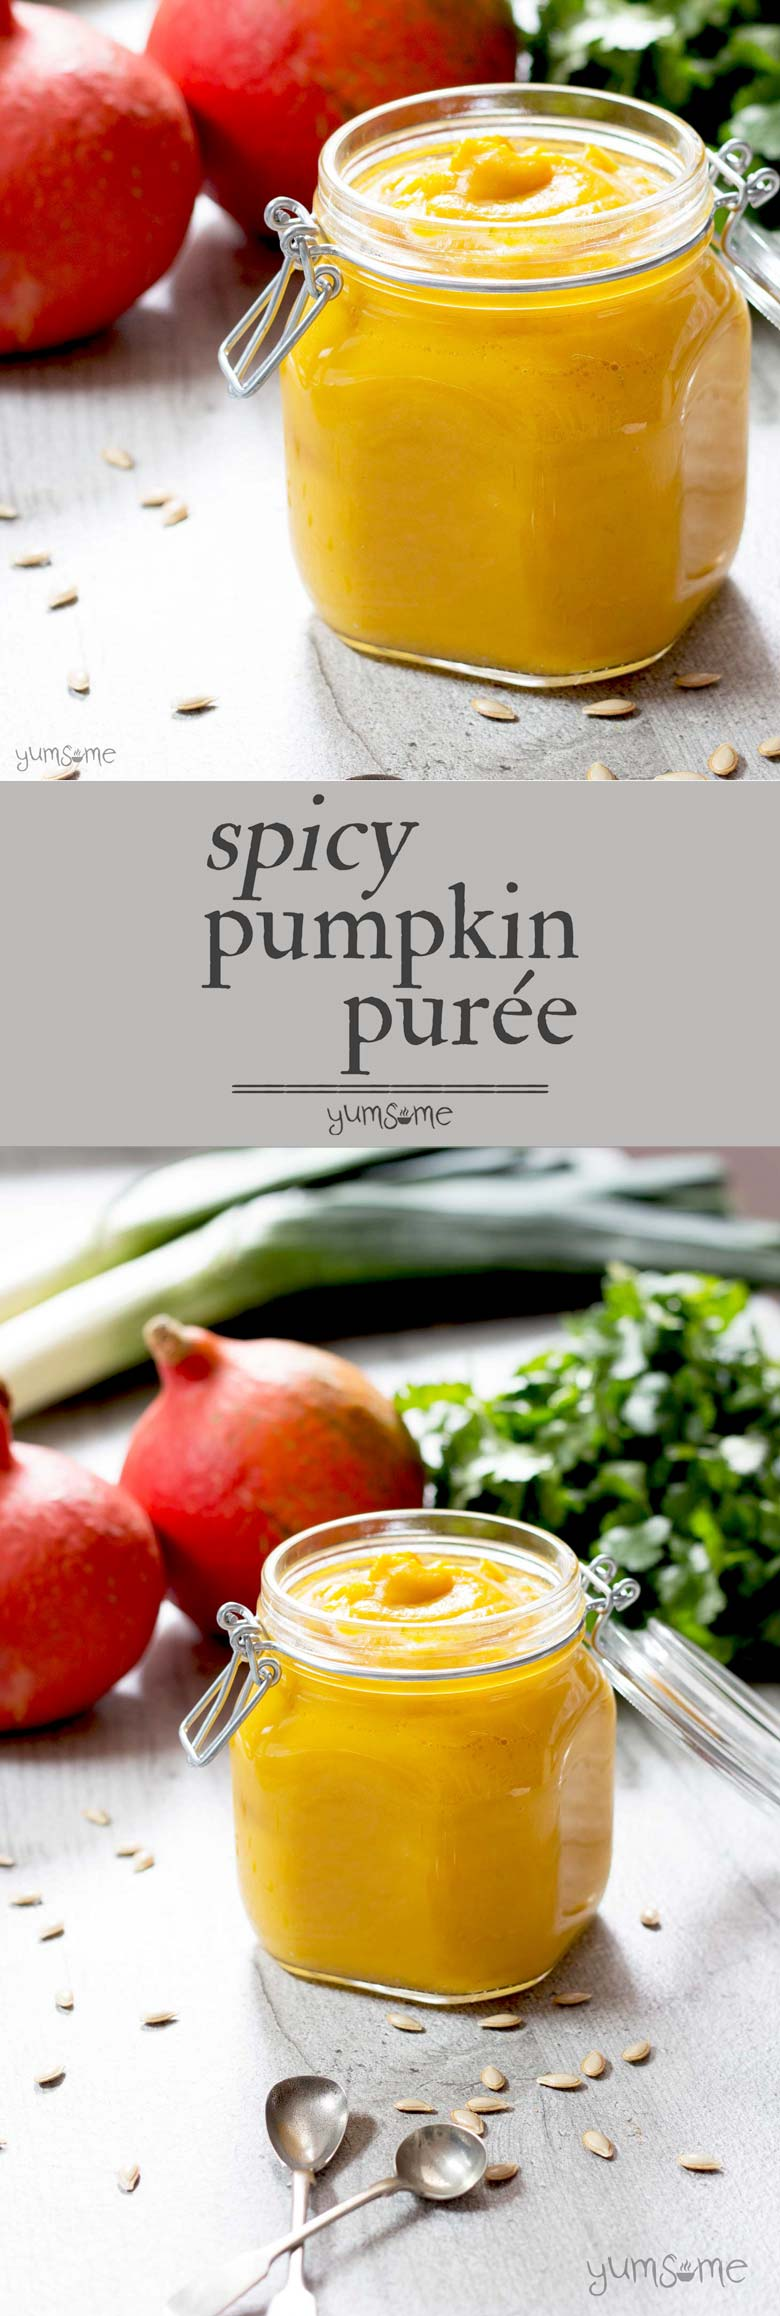 how to prepare pumpkin puree